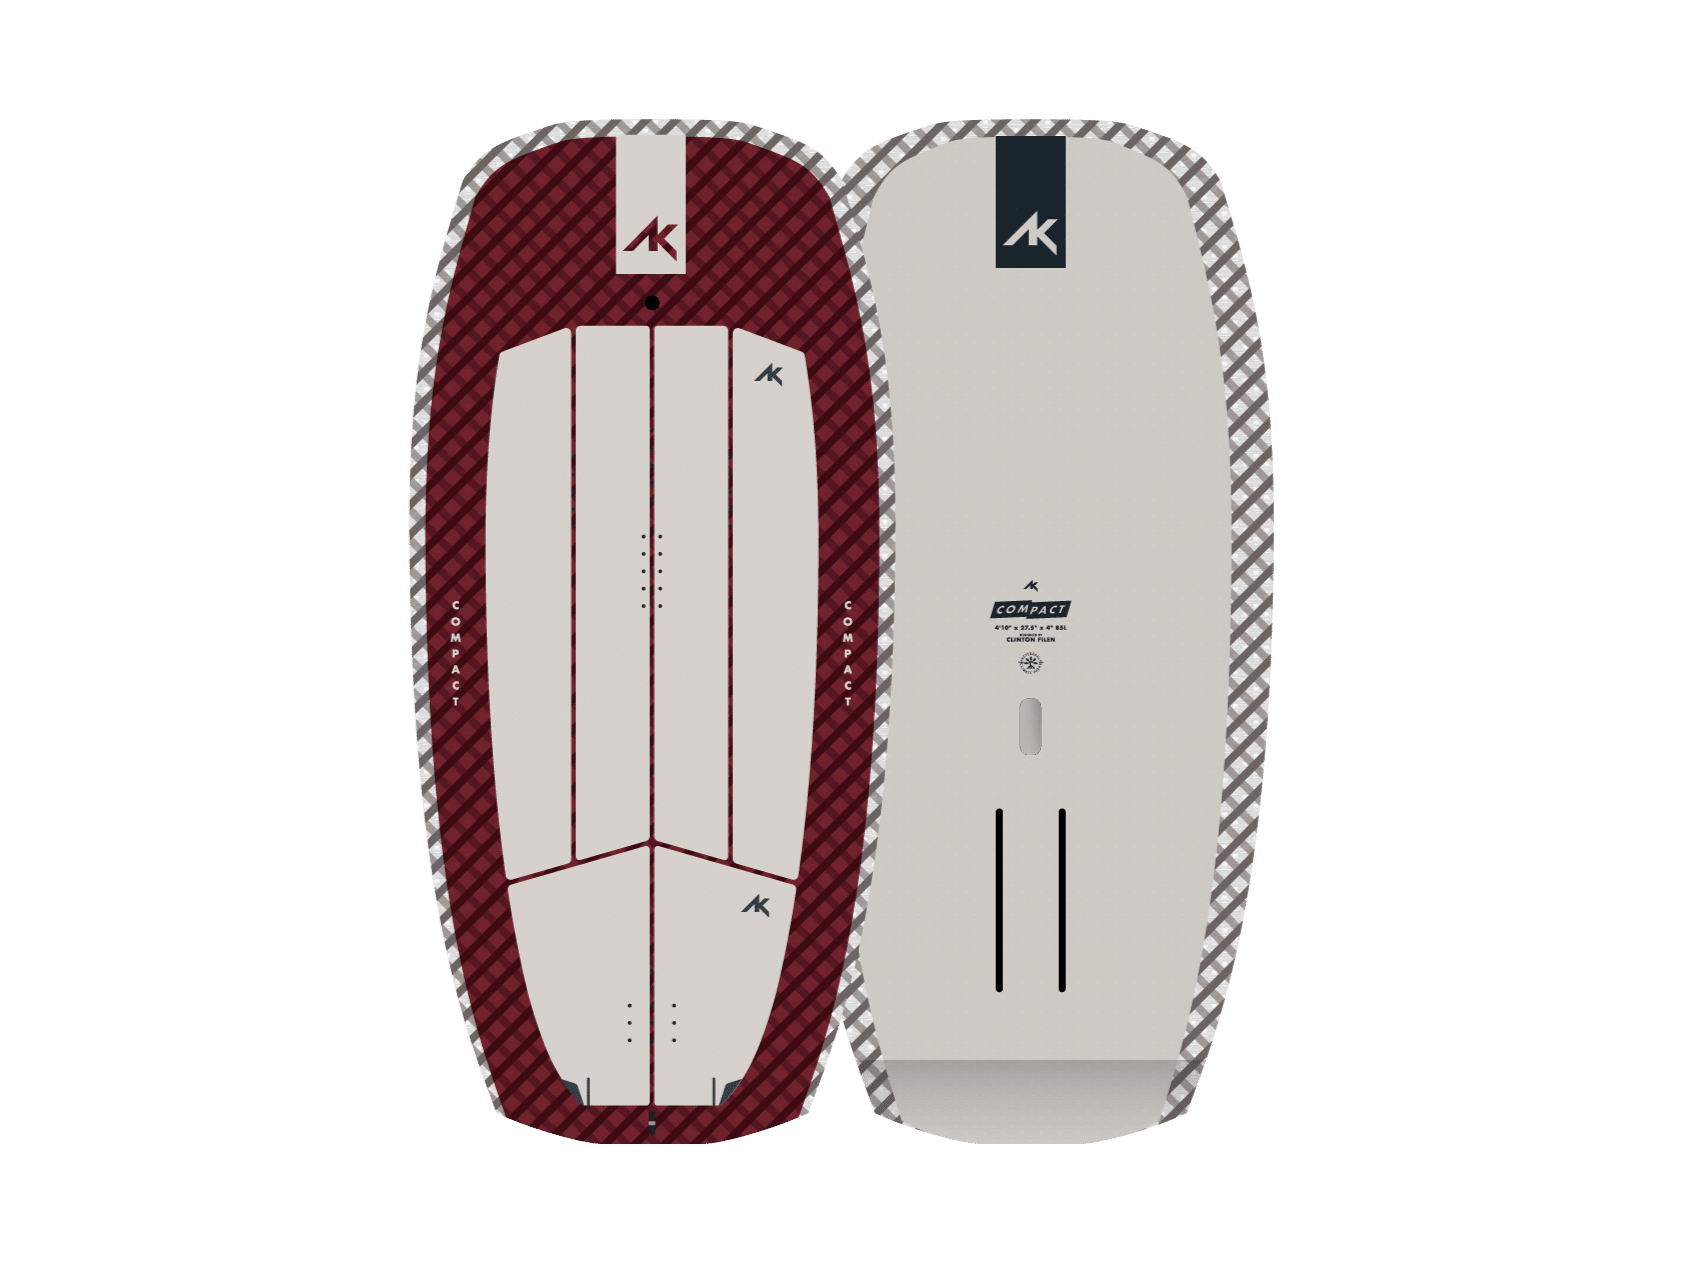 21_AK_Compact Foilboard_img_01